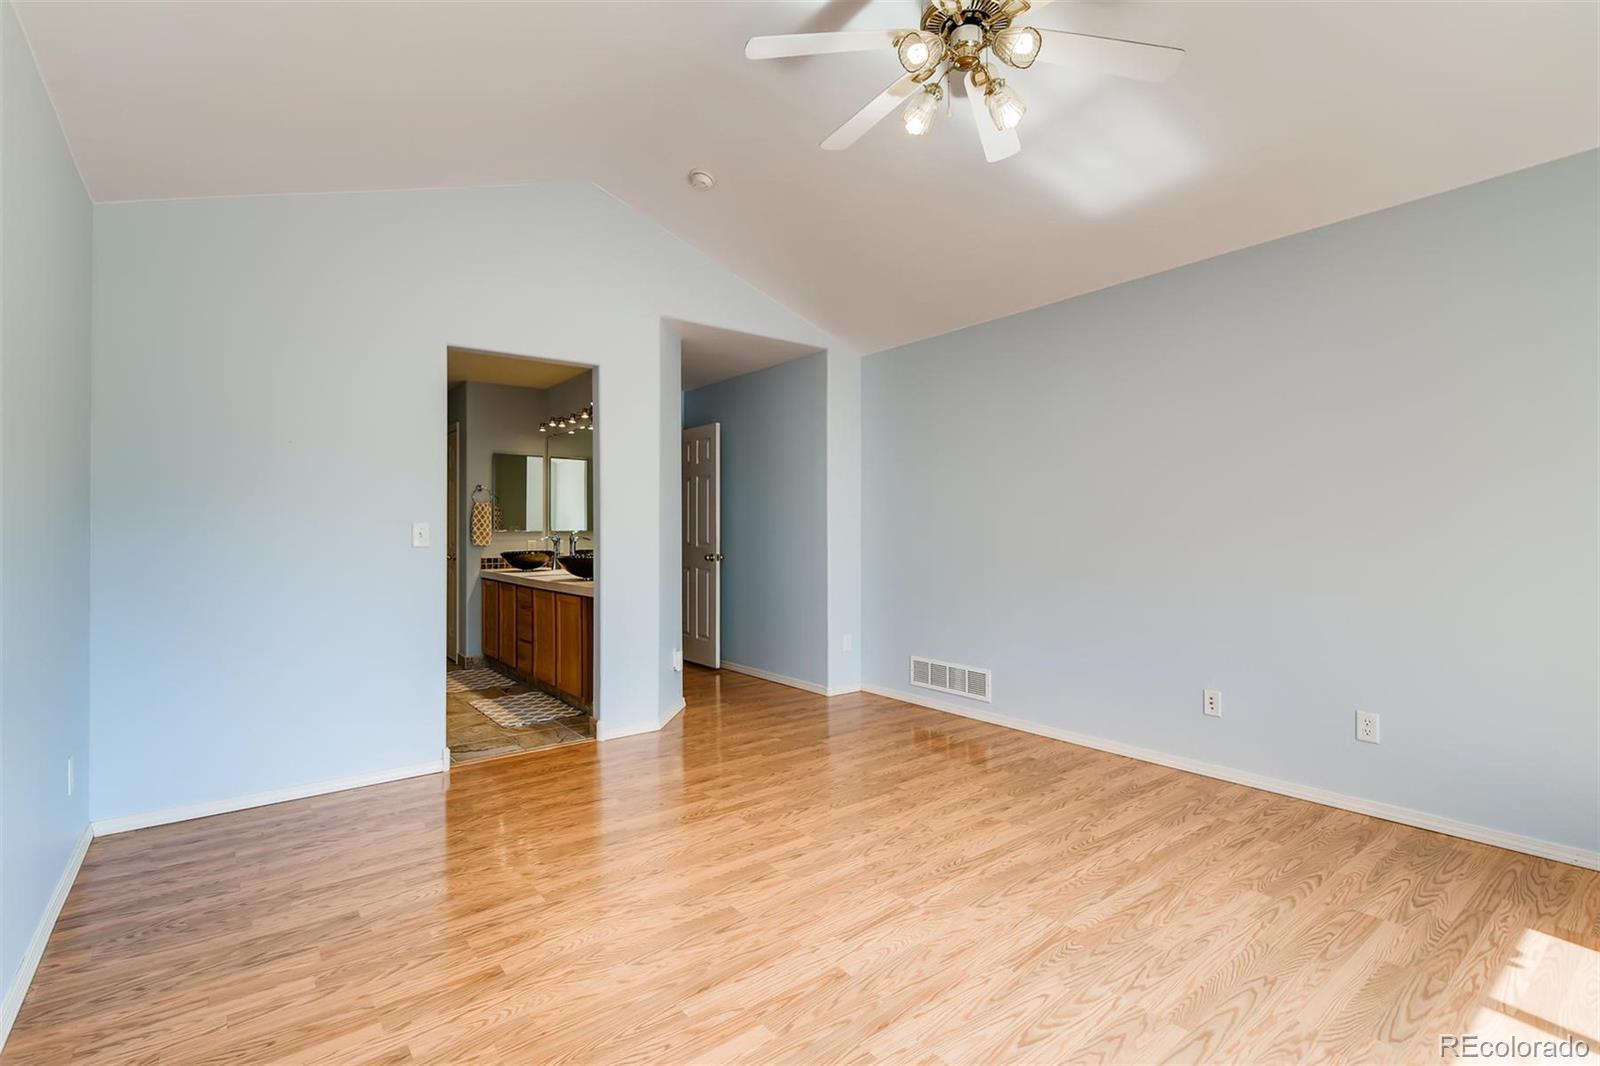 MLS# 9724731 - 21 - 498 Promontory Drive, Loveland, CO 80537